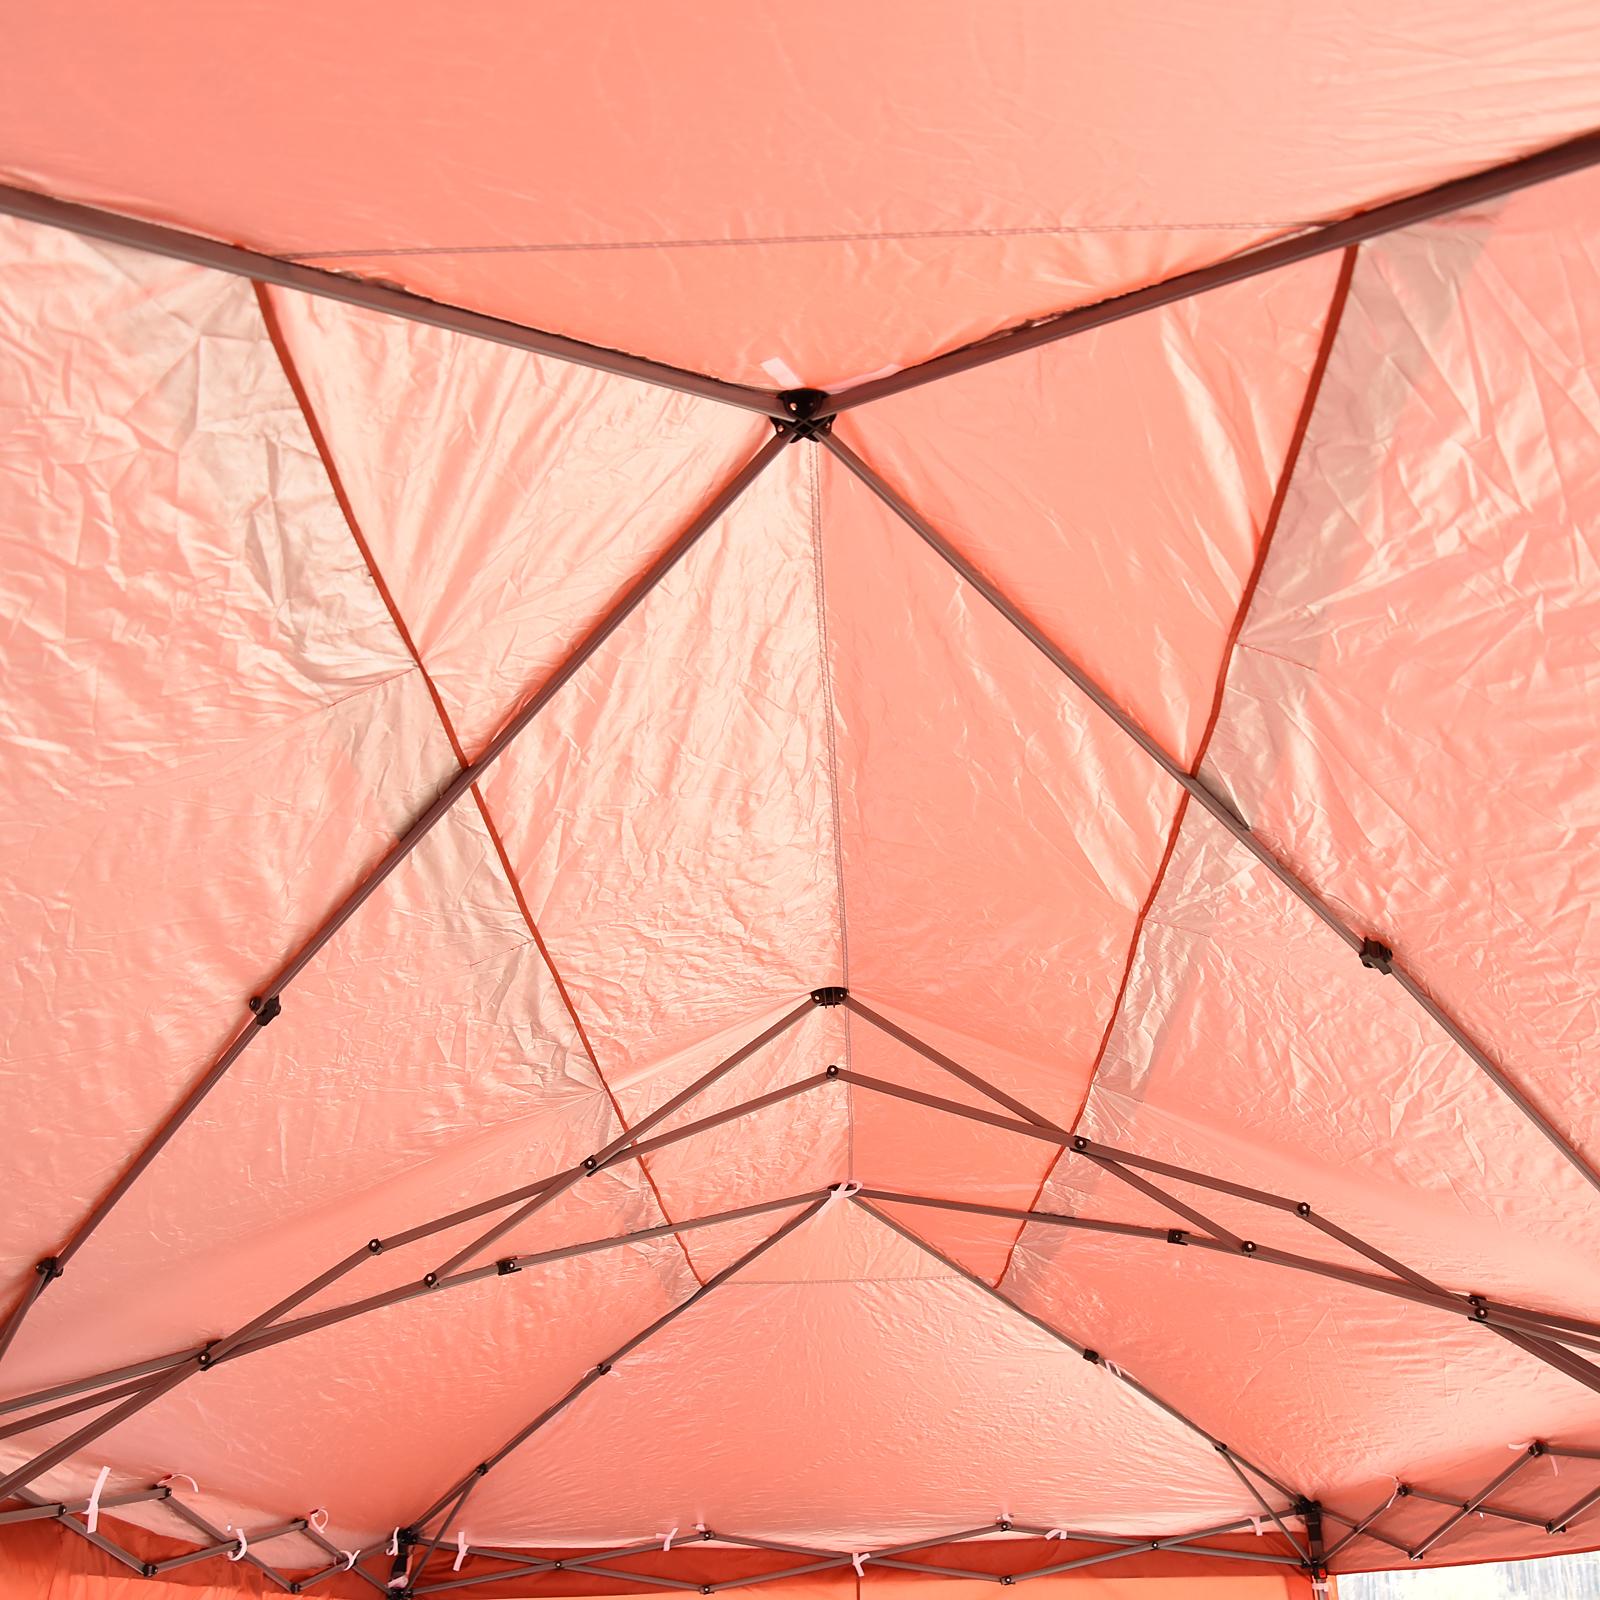 Outdoor-10-039-x20-039-EZ-POP-UP-Gazebo-Wedding-Party-Tent-Canopy-Folding-w-Carry-Bag thumbnail 40